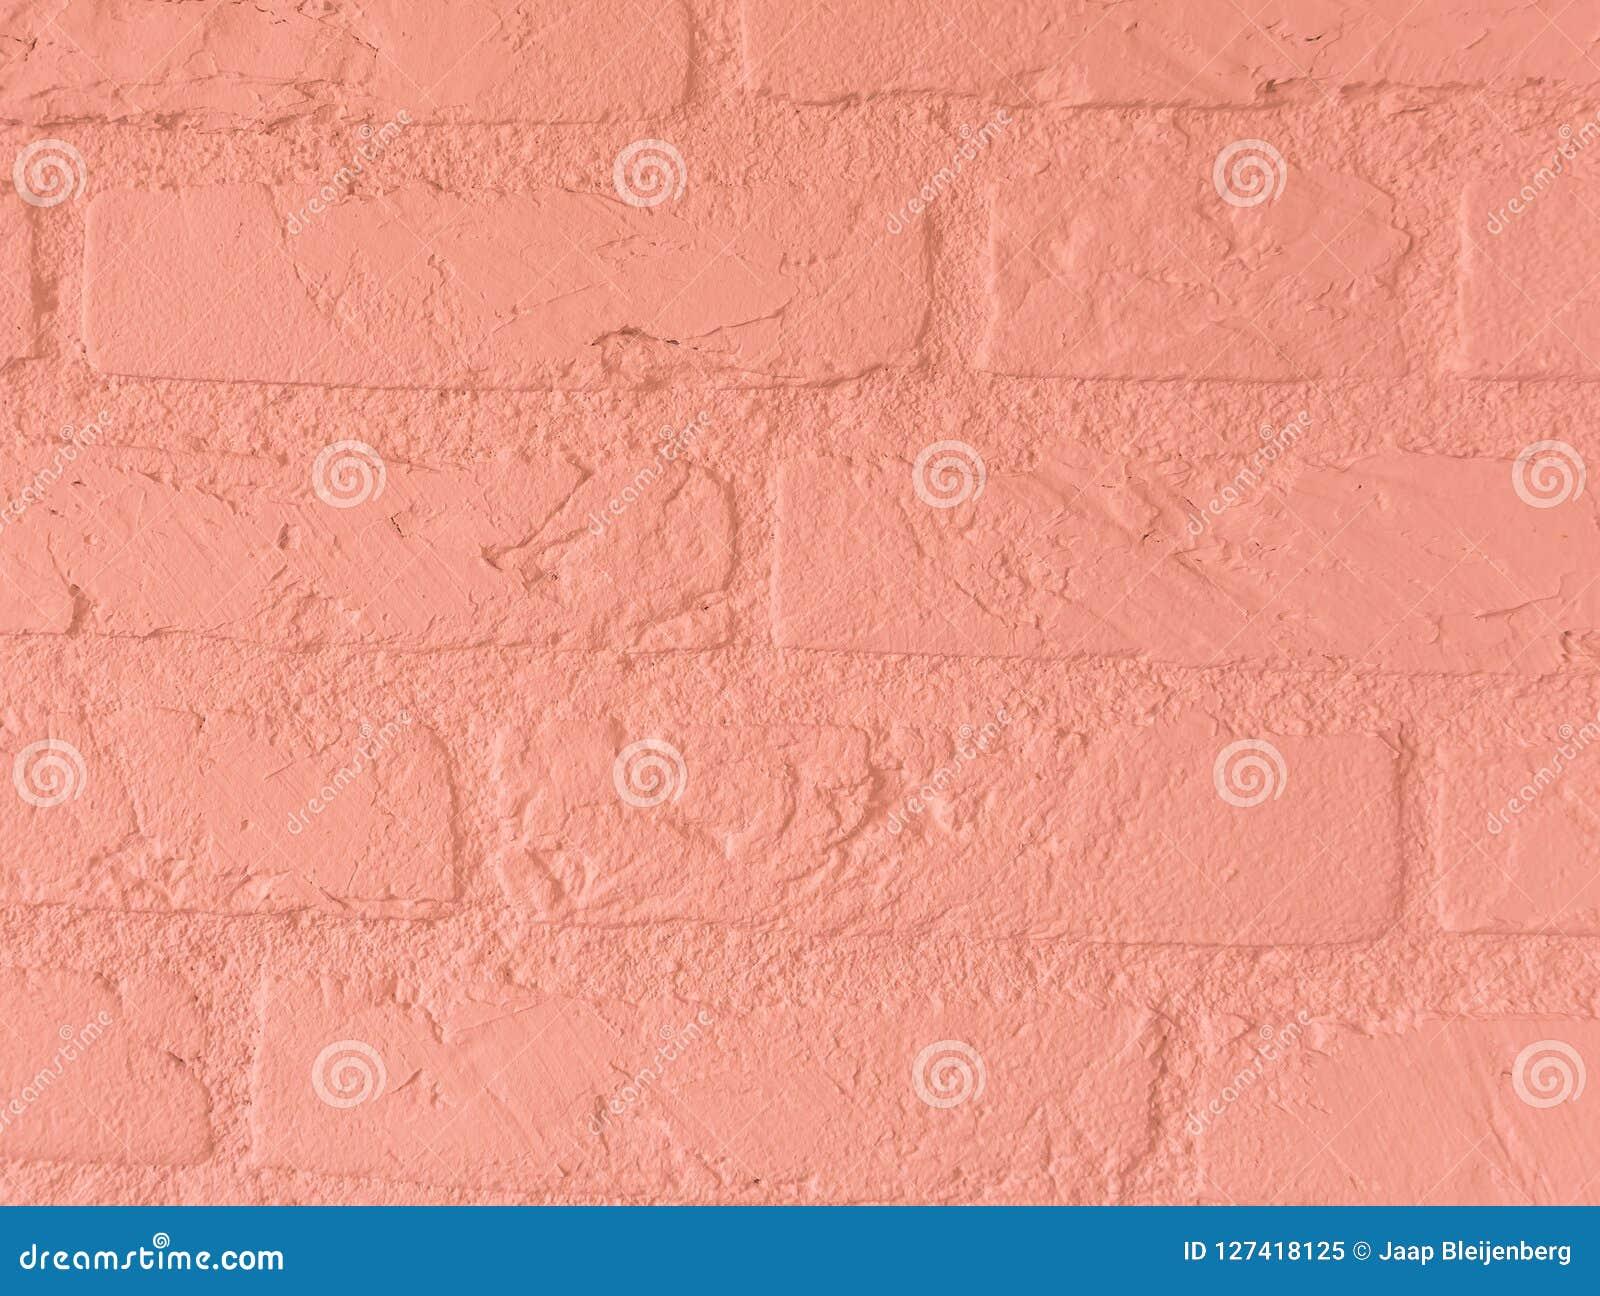 Modern soft light pink stone brick wall build of big stone bricks vintage background pattern